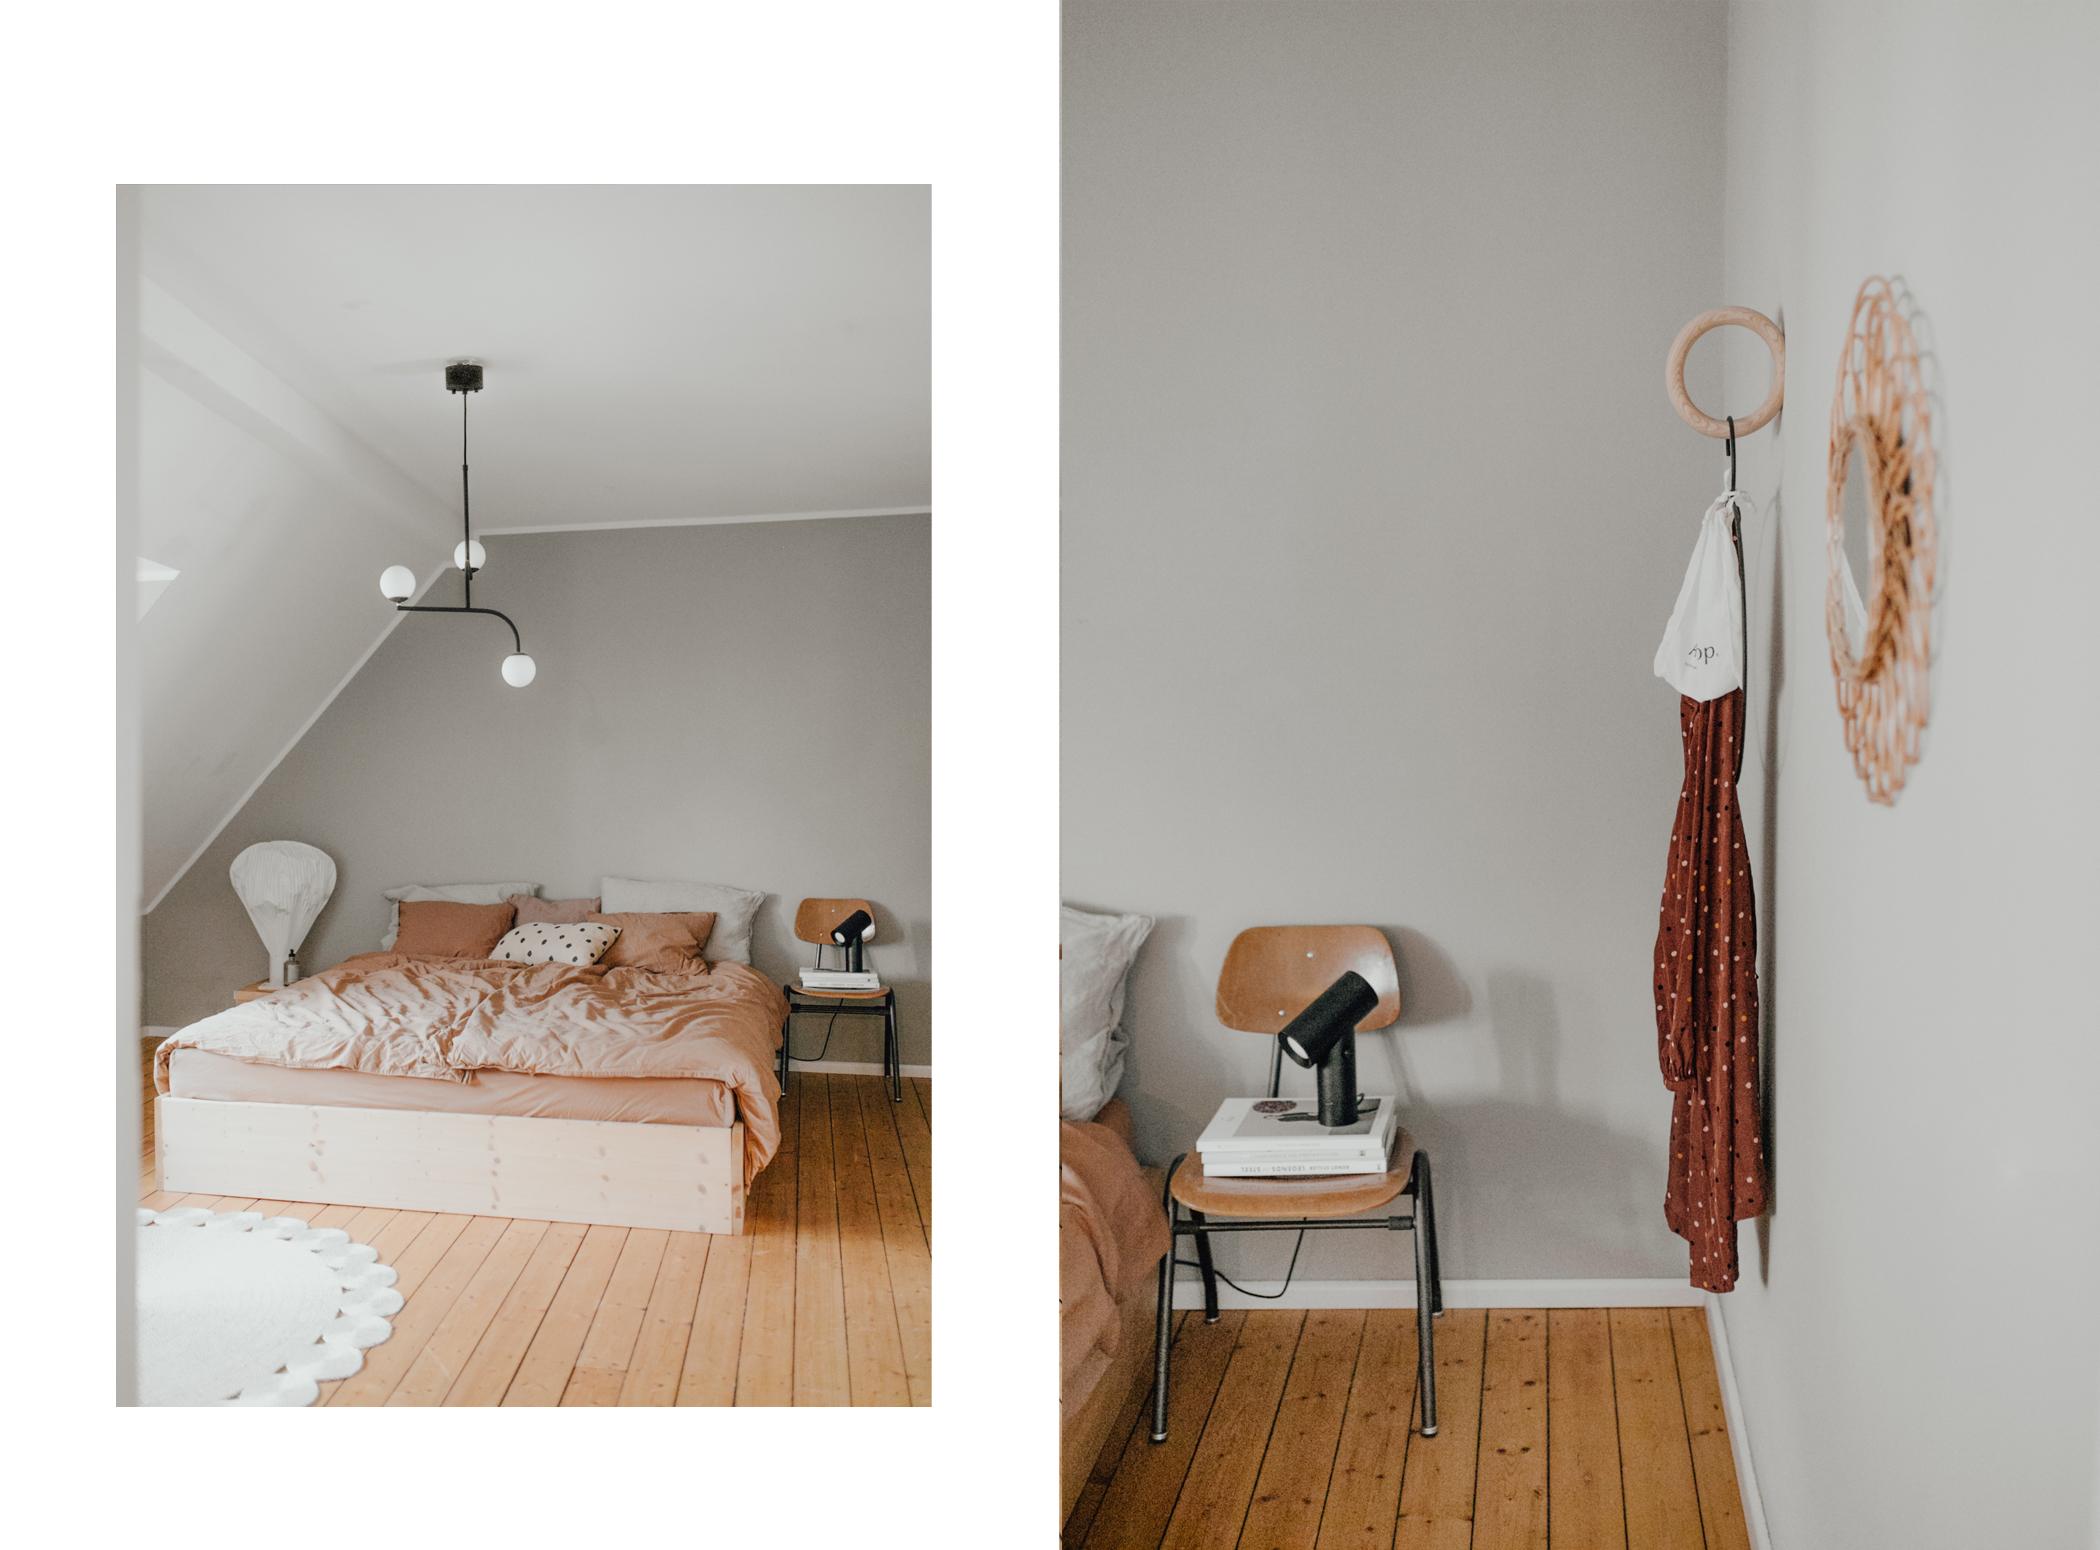 Swantje-und-frieda-homestory_036